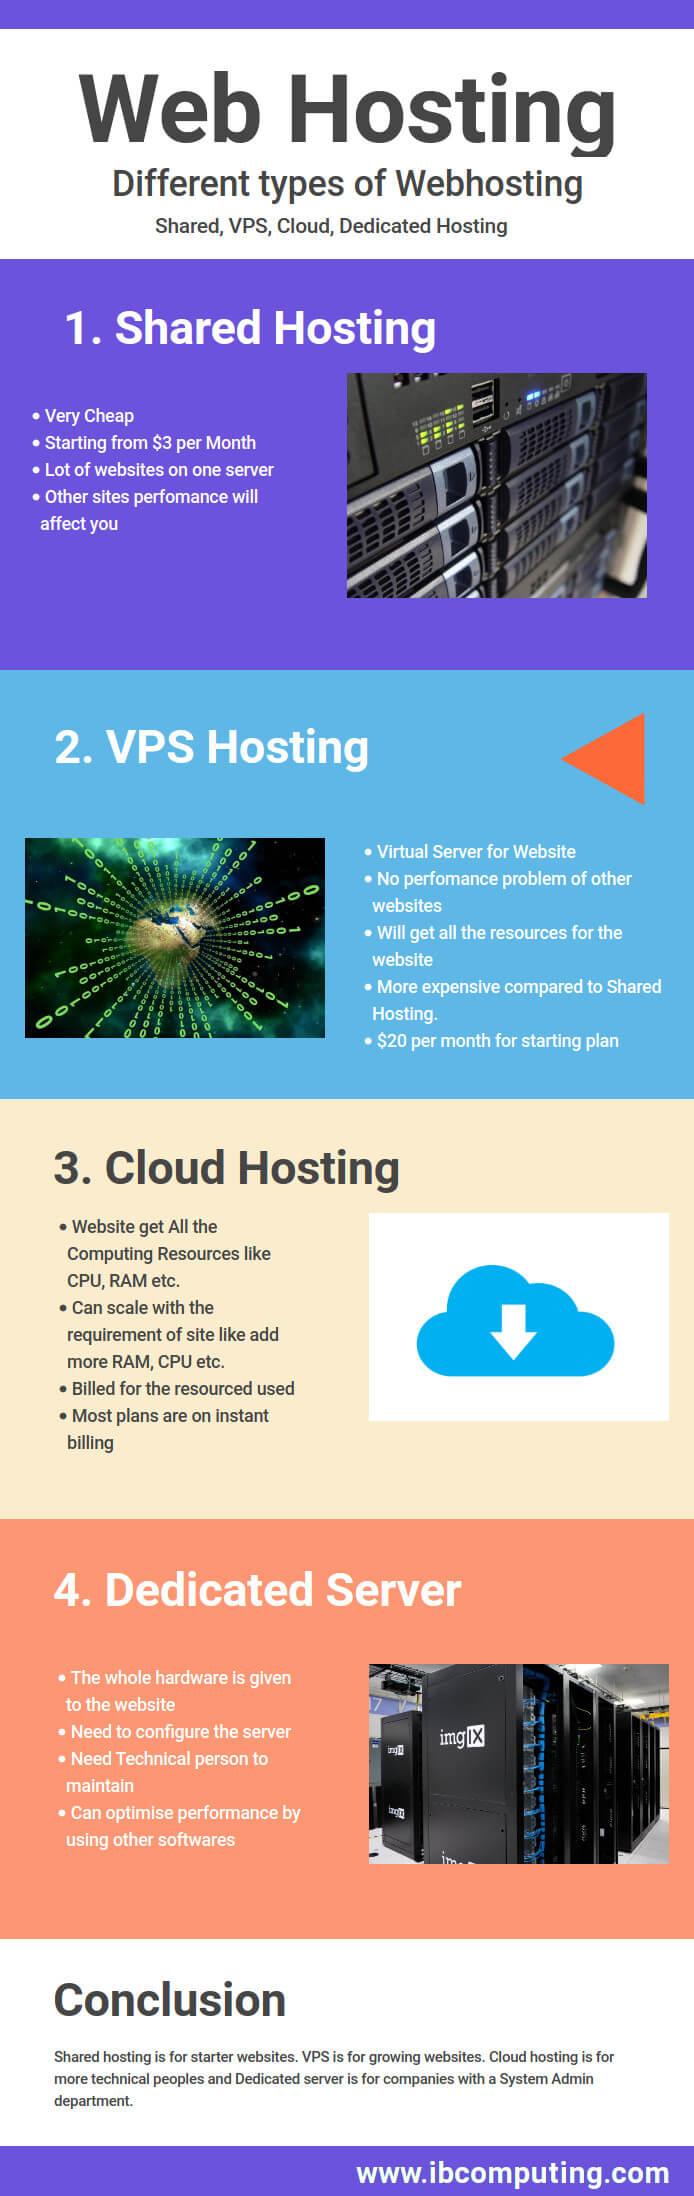 Webhosting Infographic